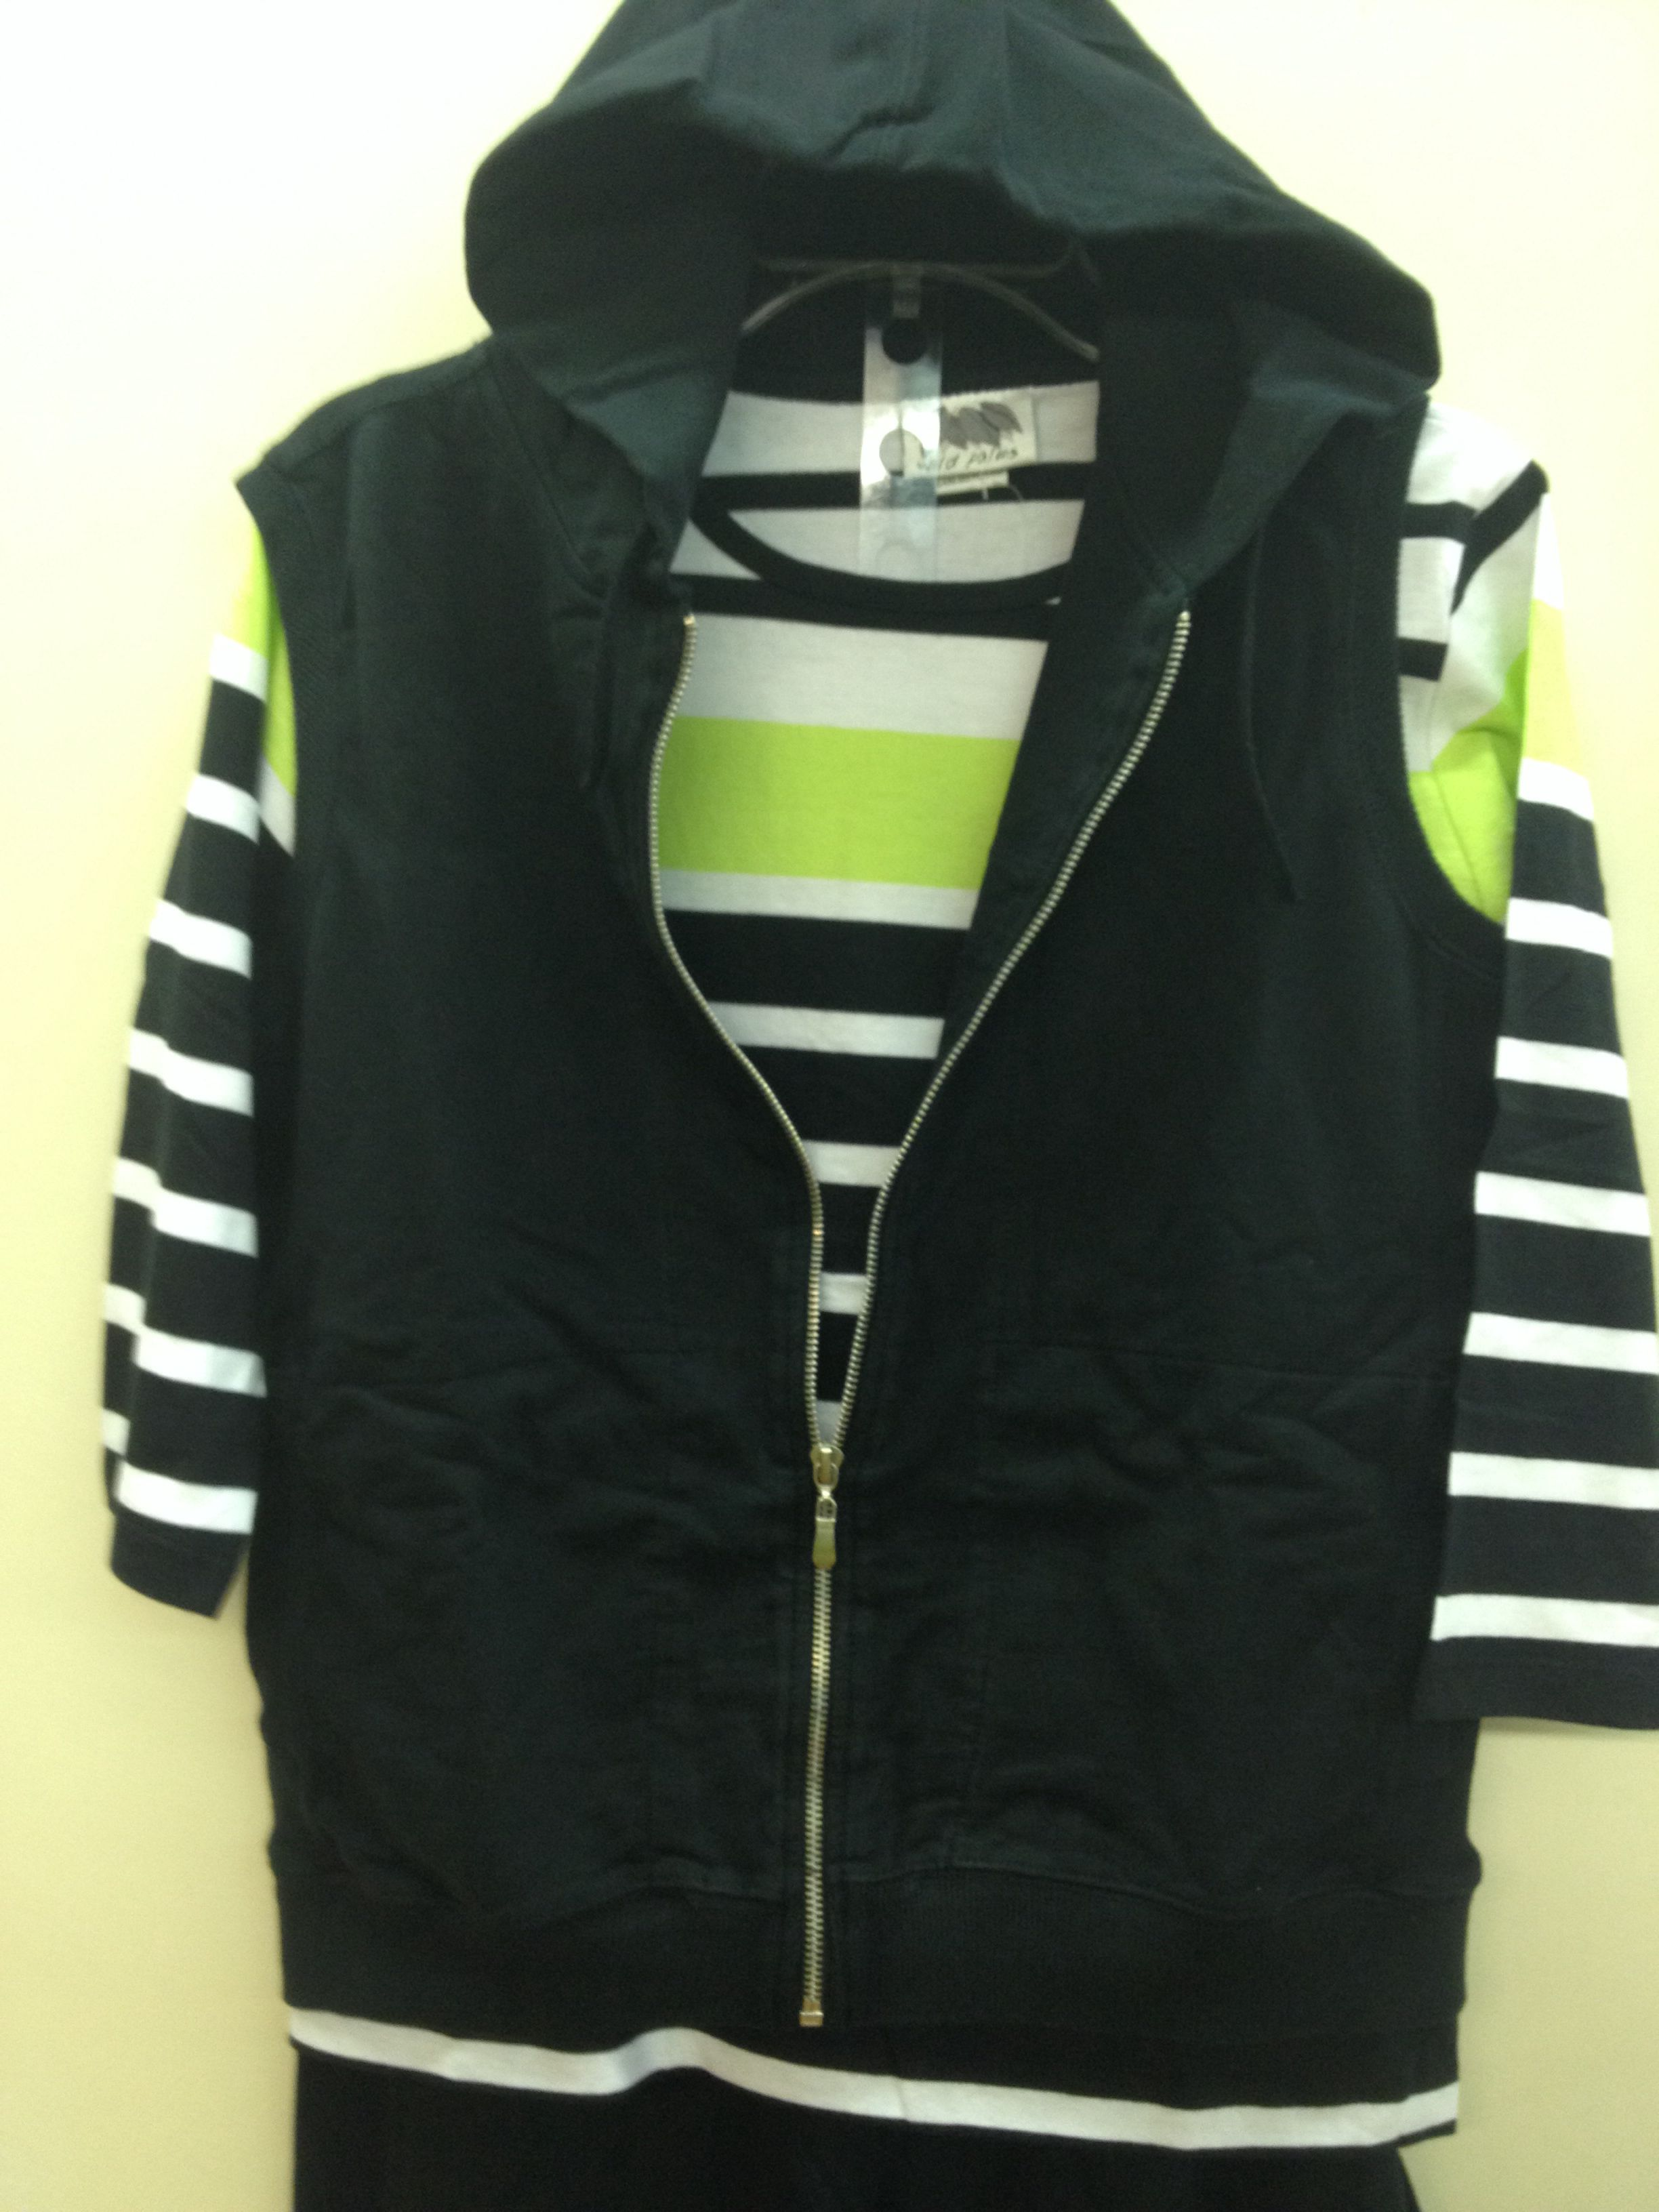 Black zipper vest with striped tee - has matching capri.